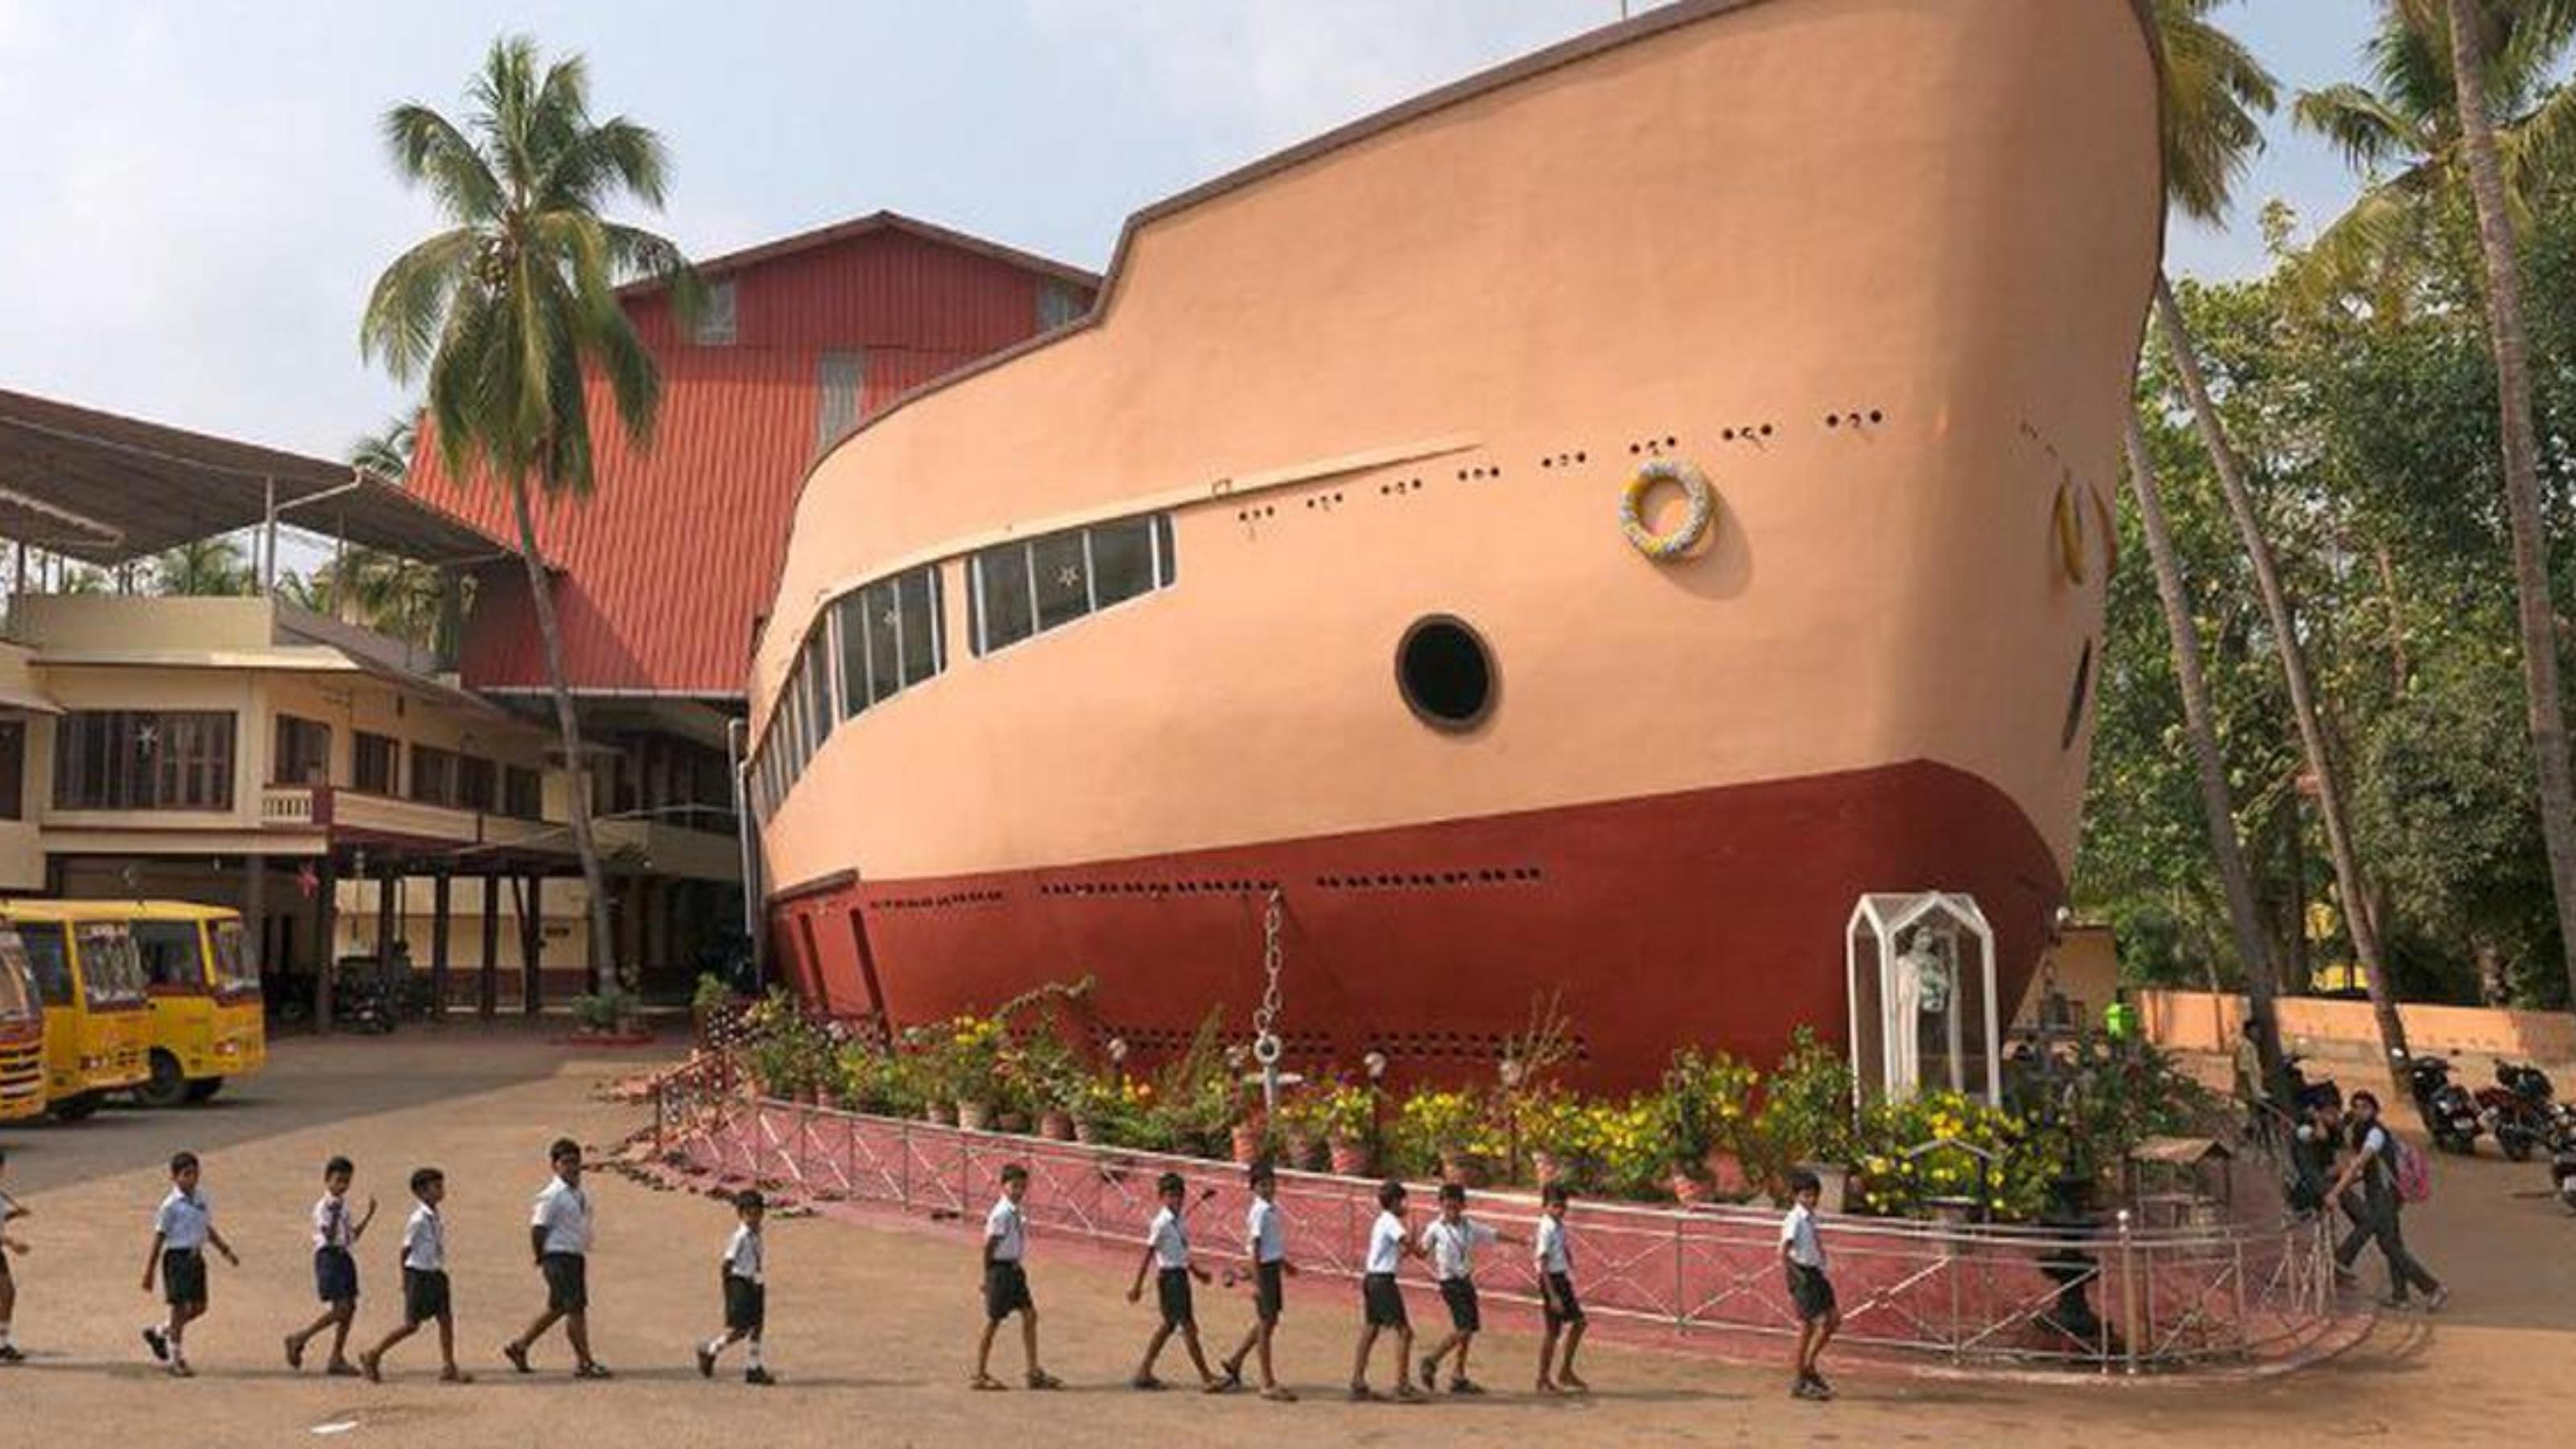 St Theresa's Ship Church in Eravu, Kerala